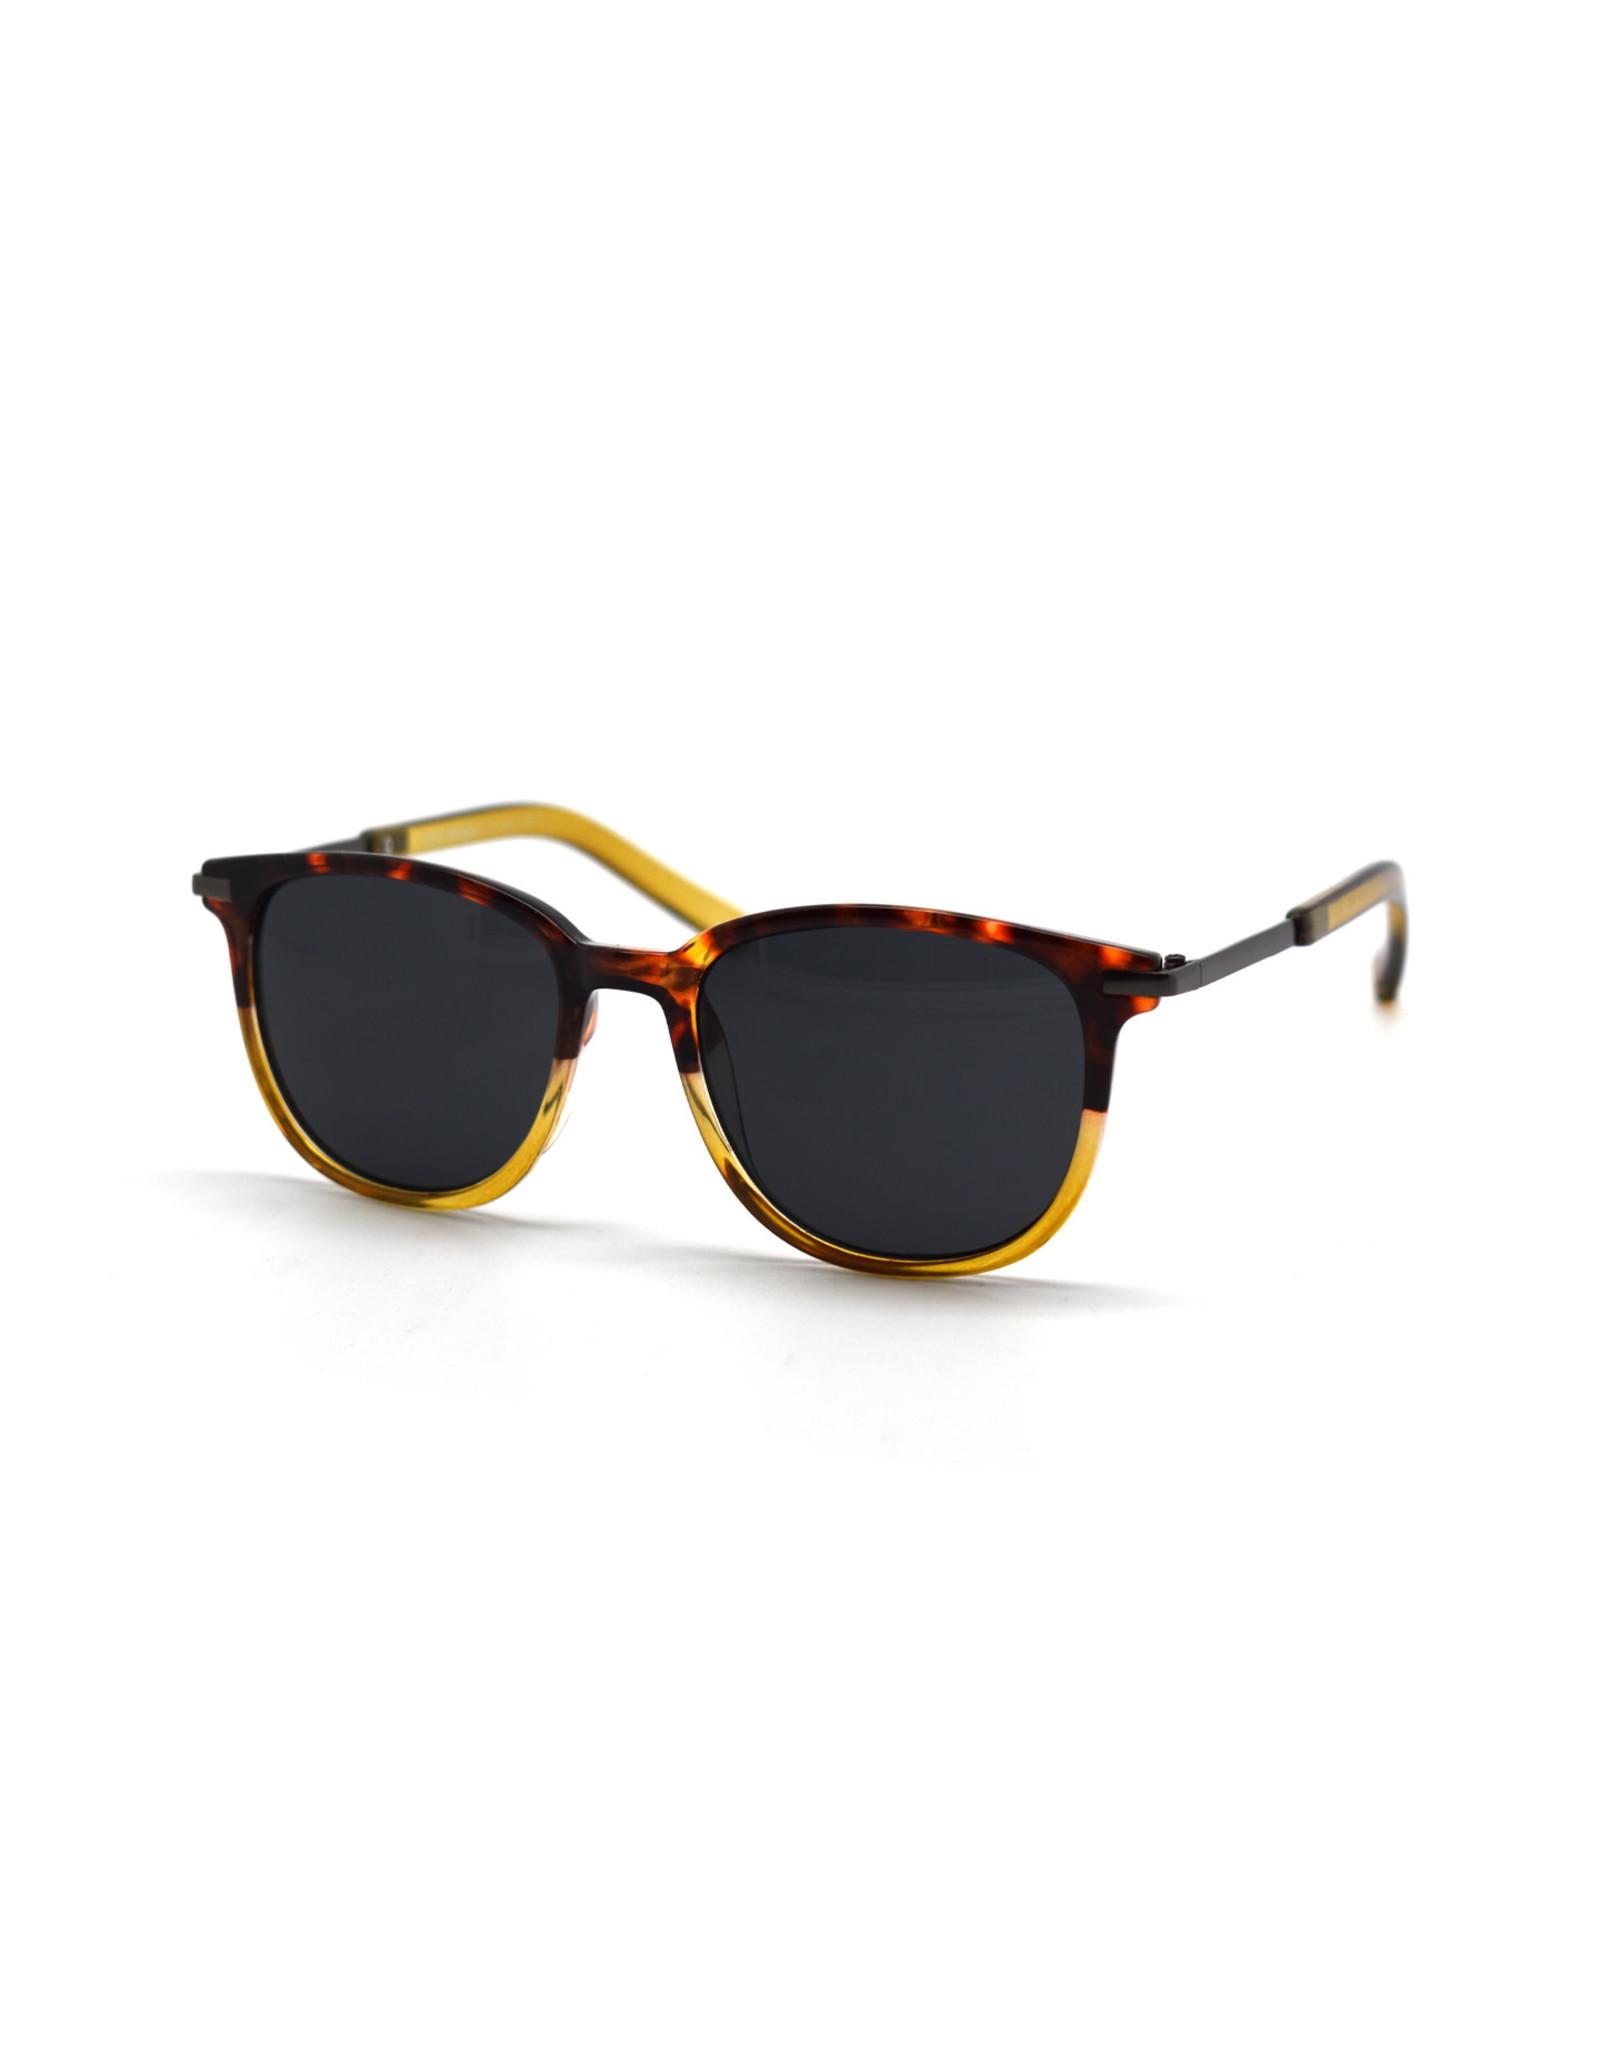 Acoustic Sunglasses